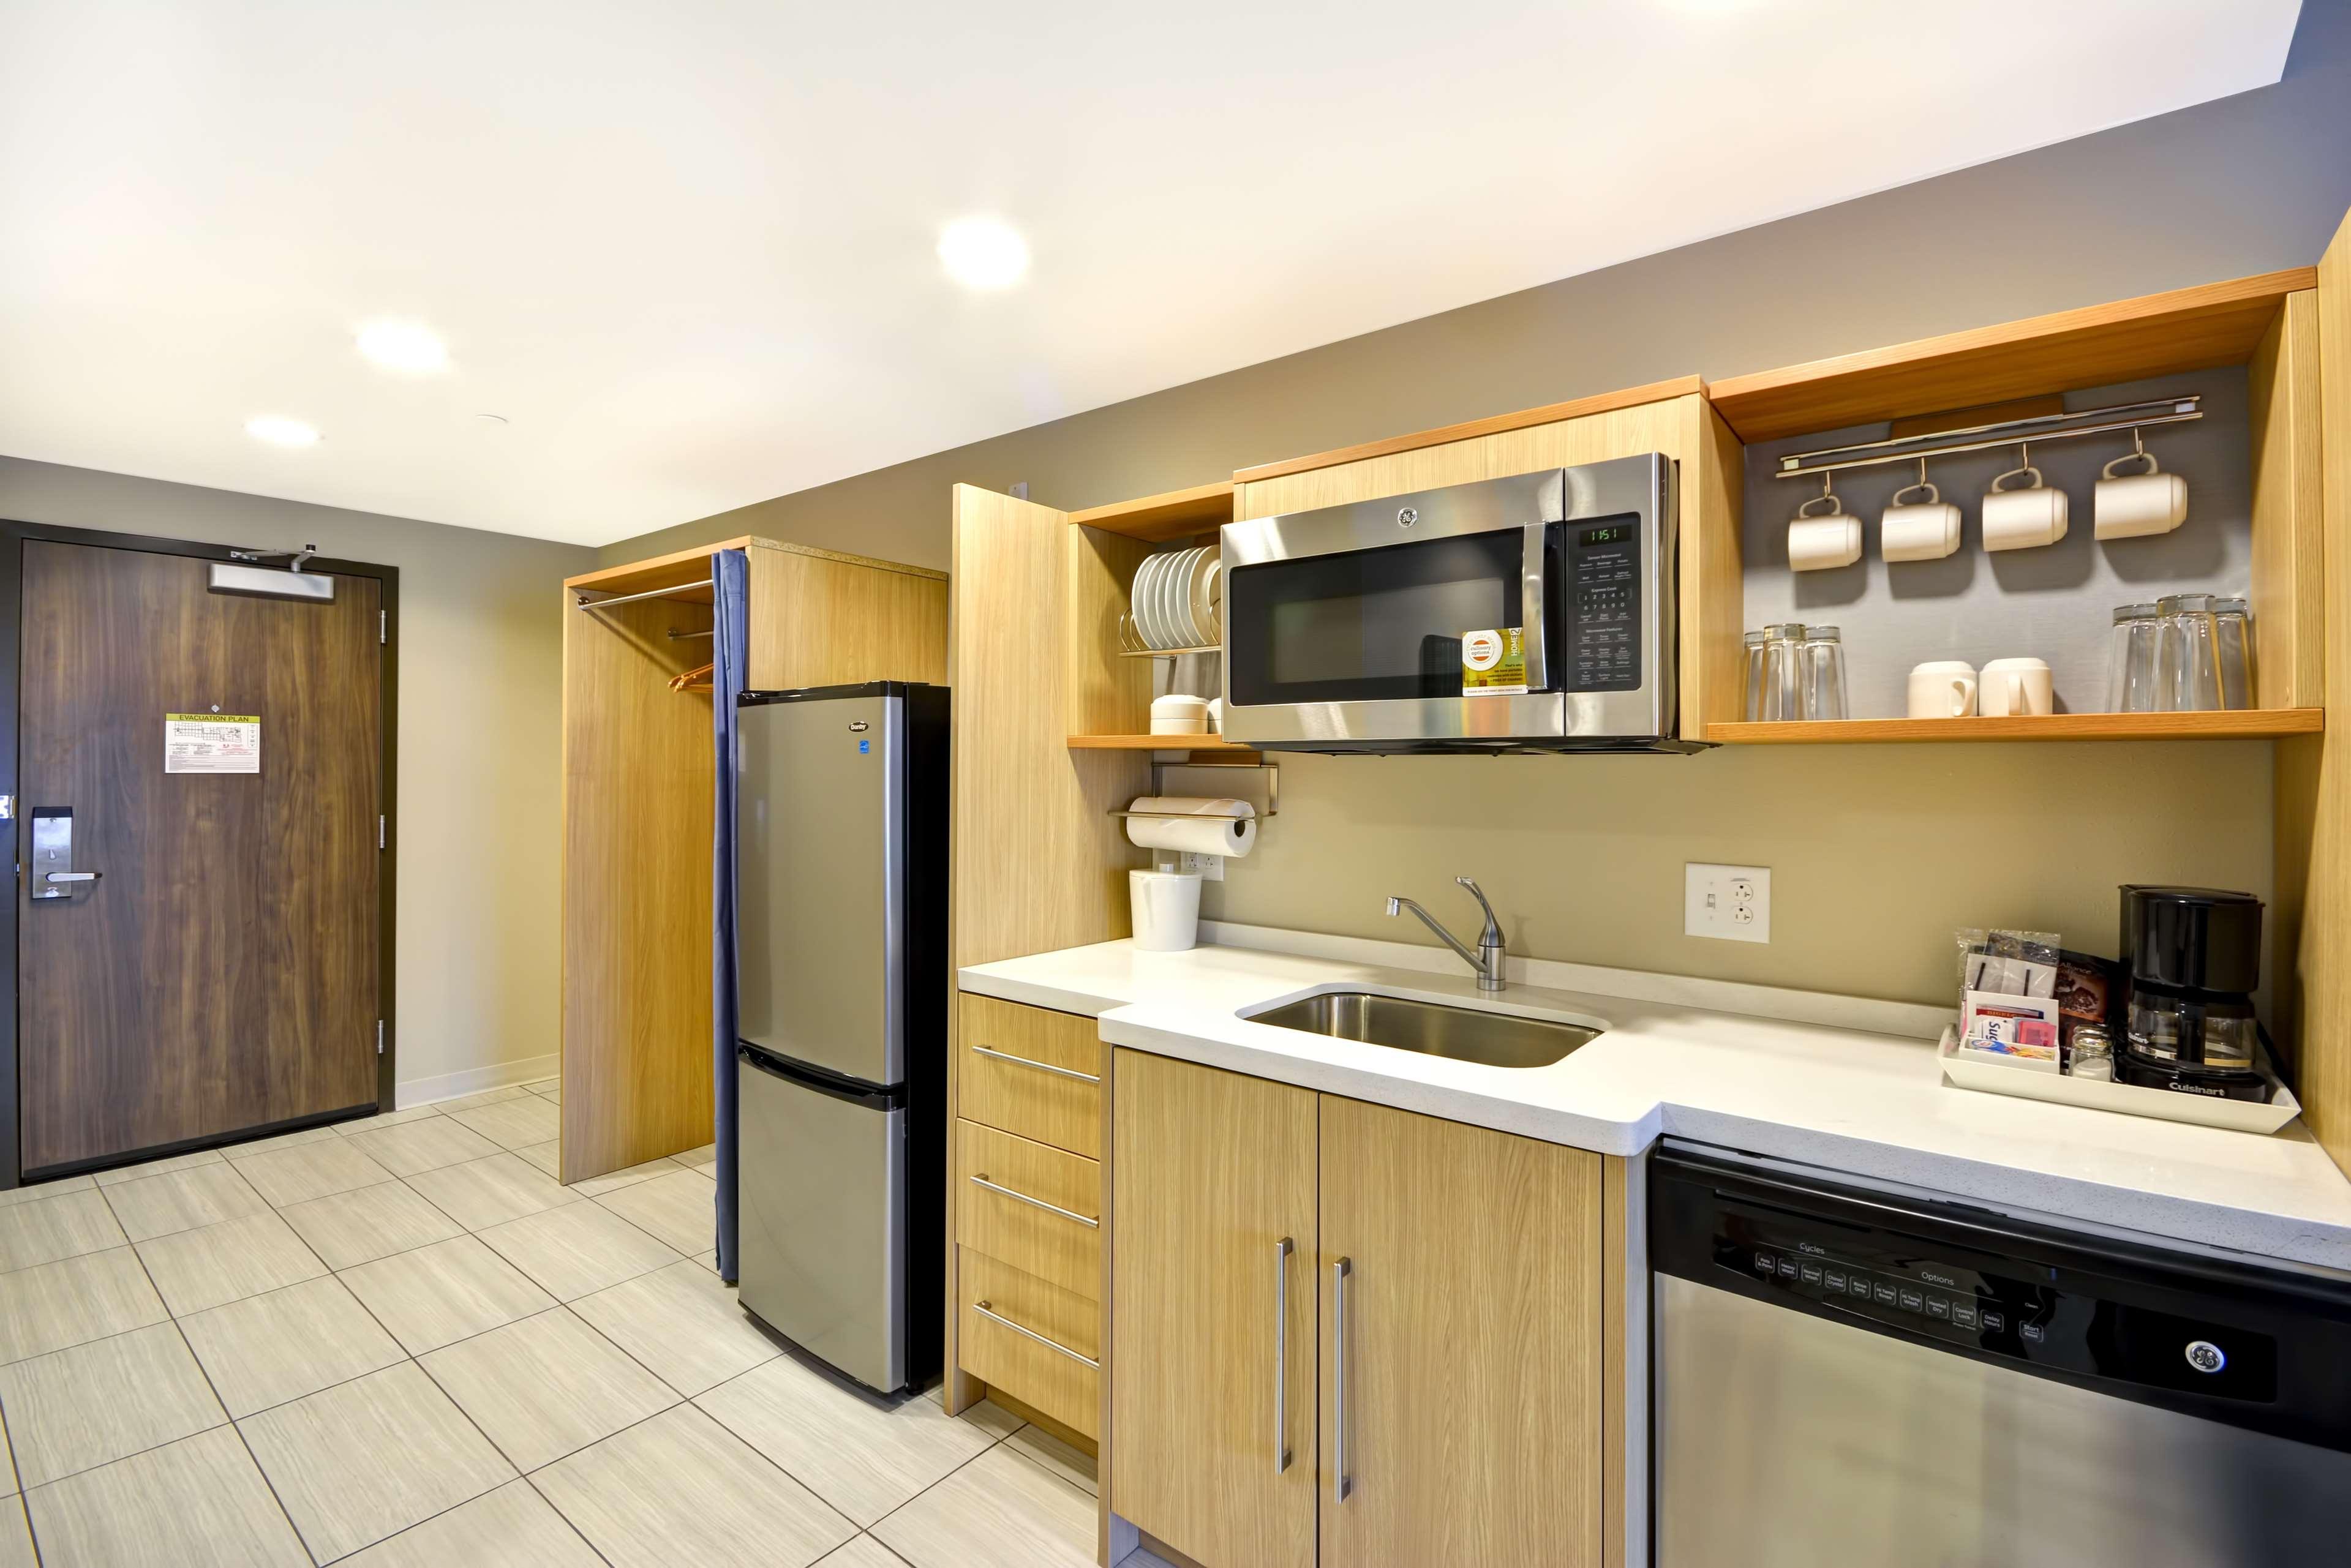 Home2 Suites by Hilton  St. Simons Island image 28